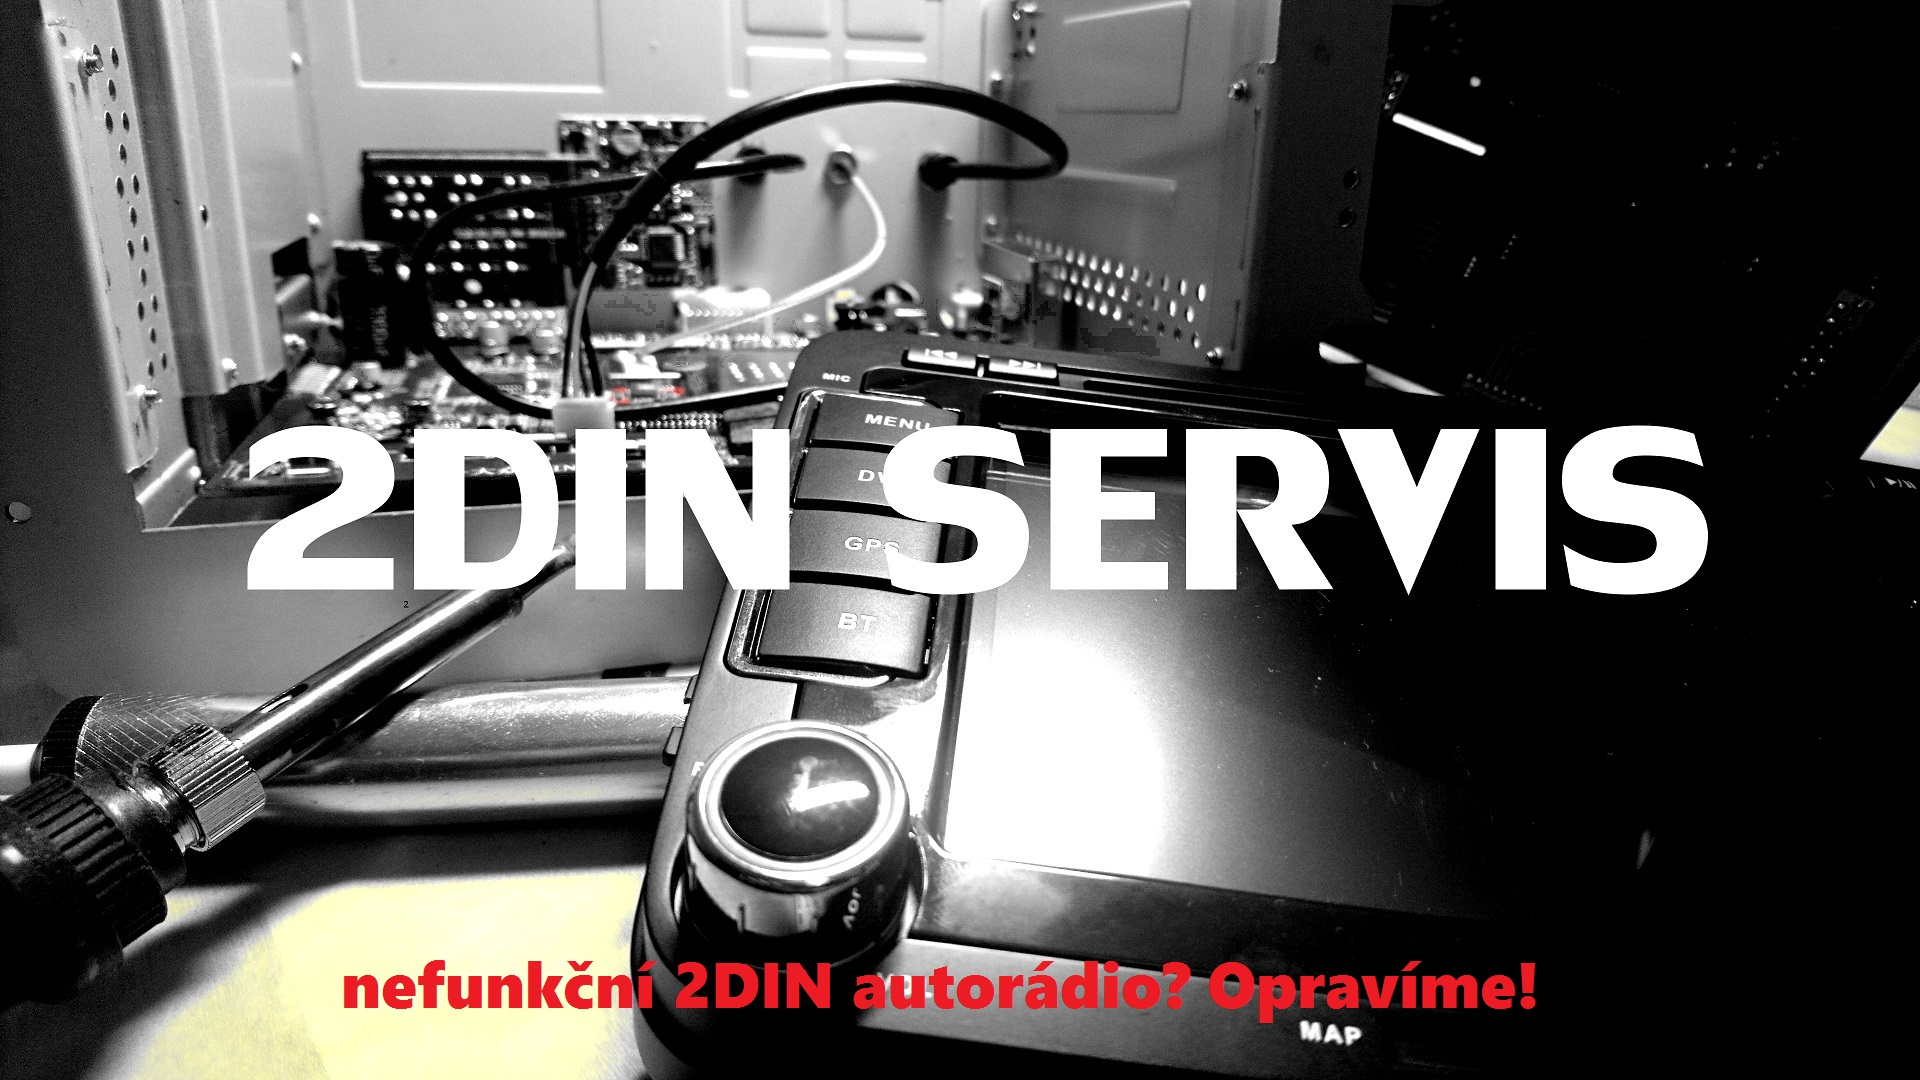 2DIN Servis